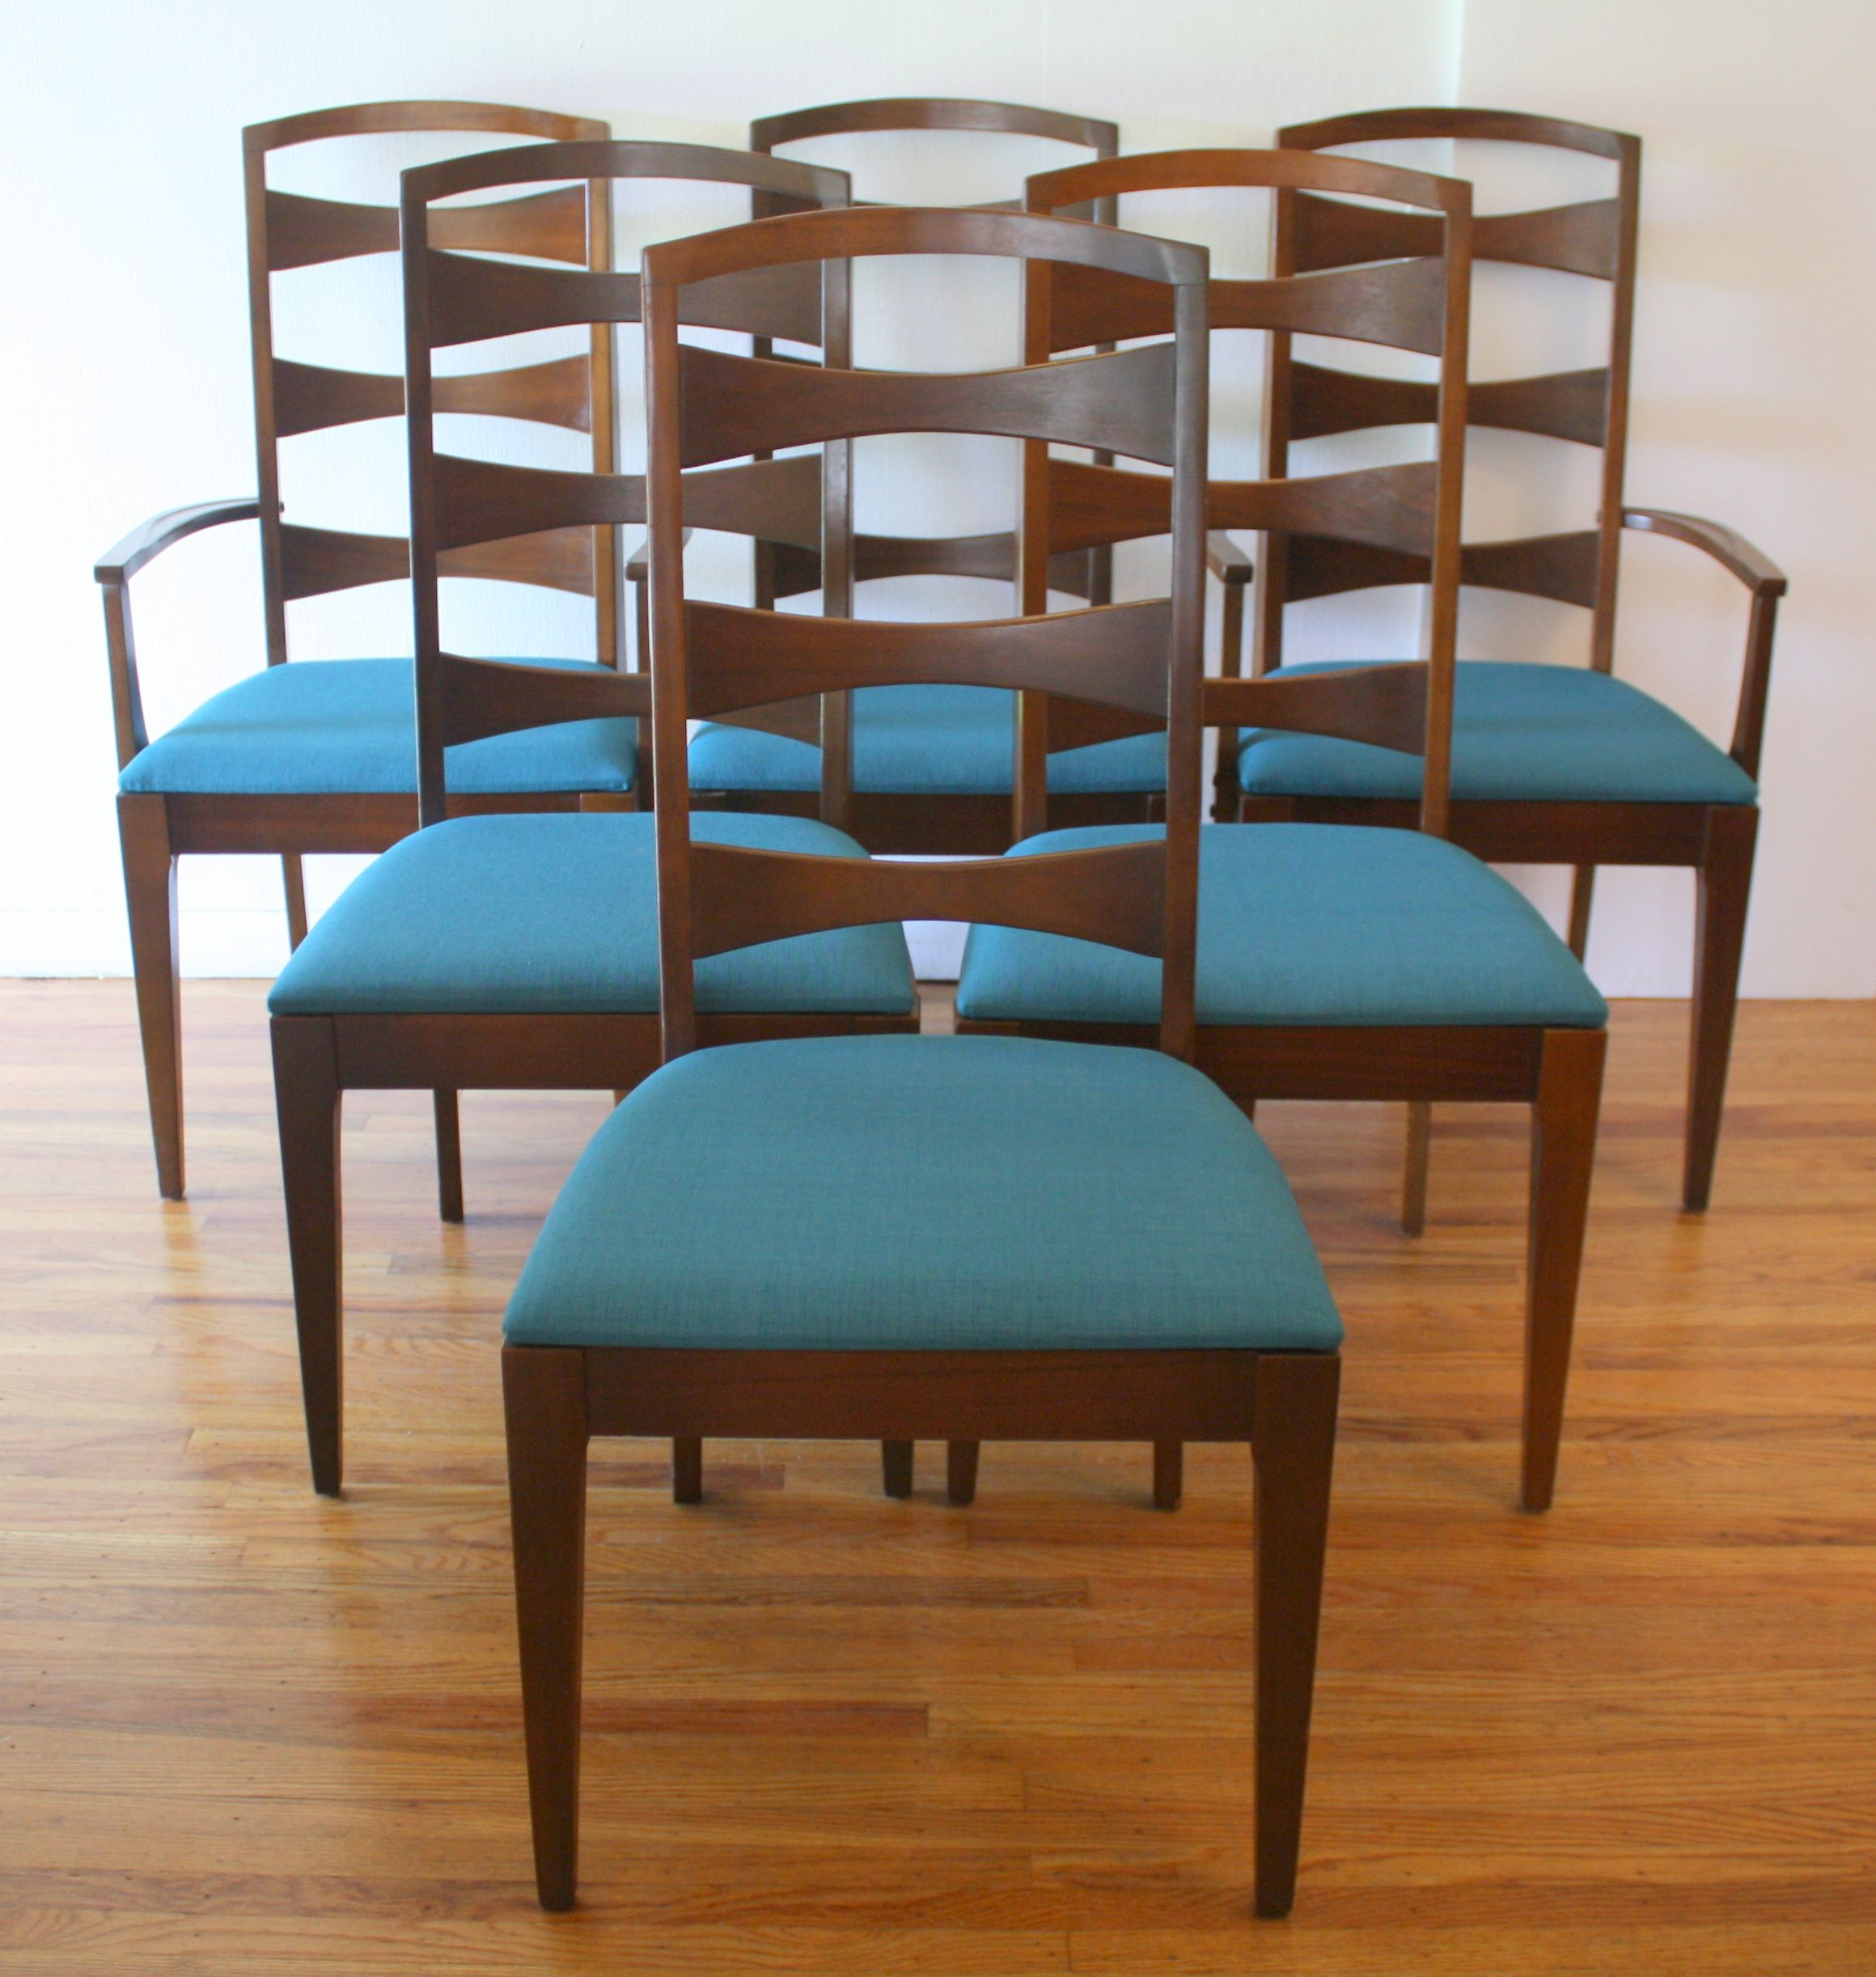 Lenoir Chairs With Teal Tweed 1